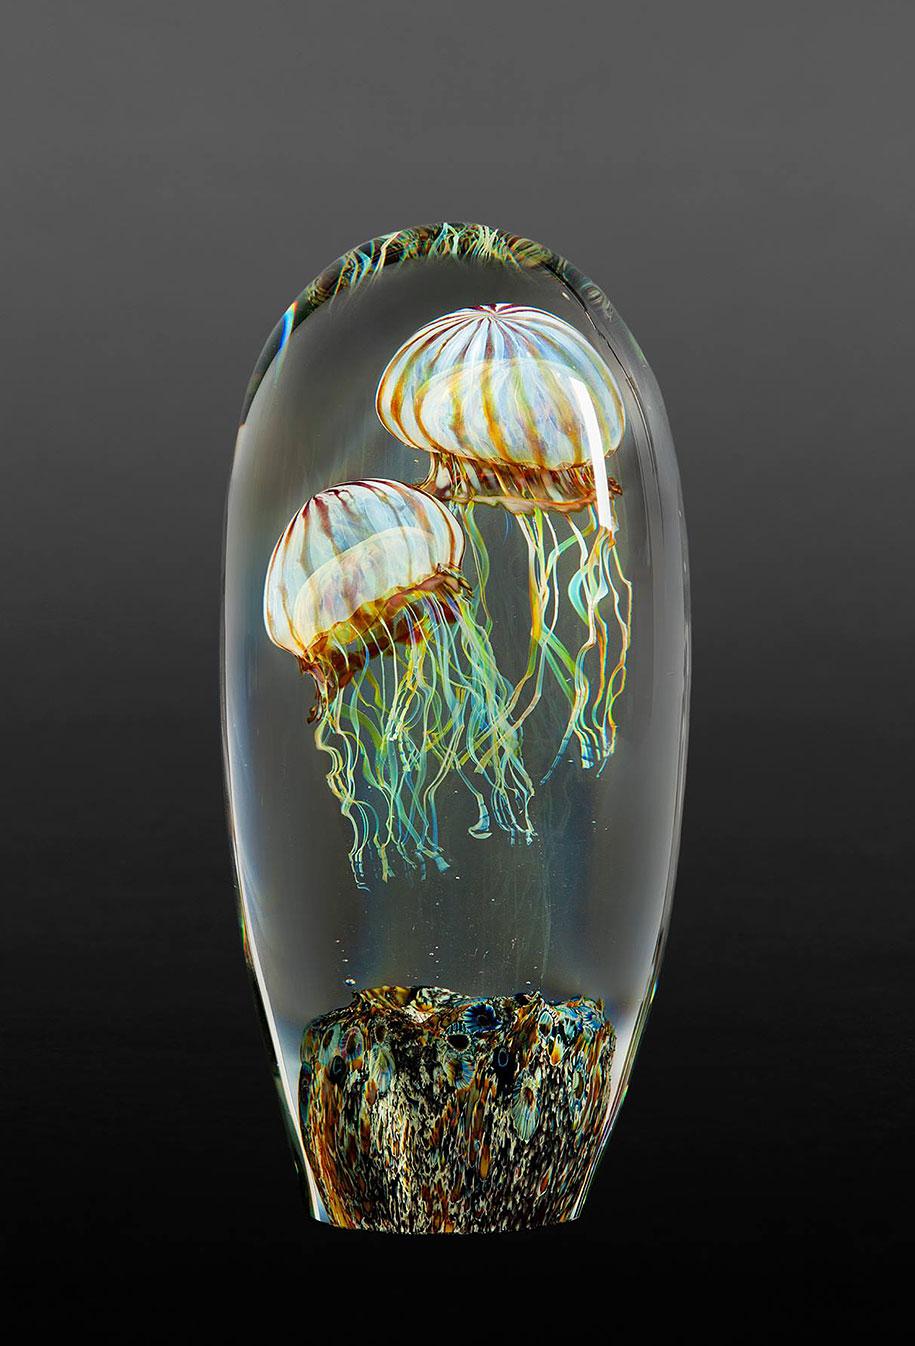 realistic-glass-jellyfish-sculpture-richard-satava-2